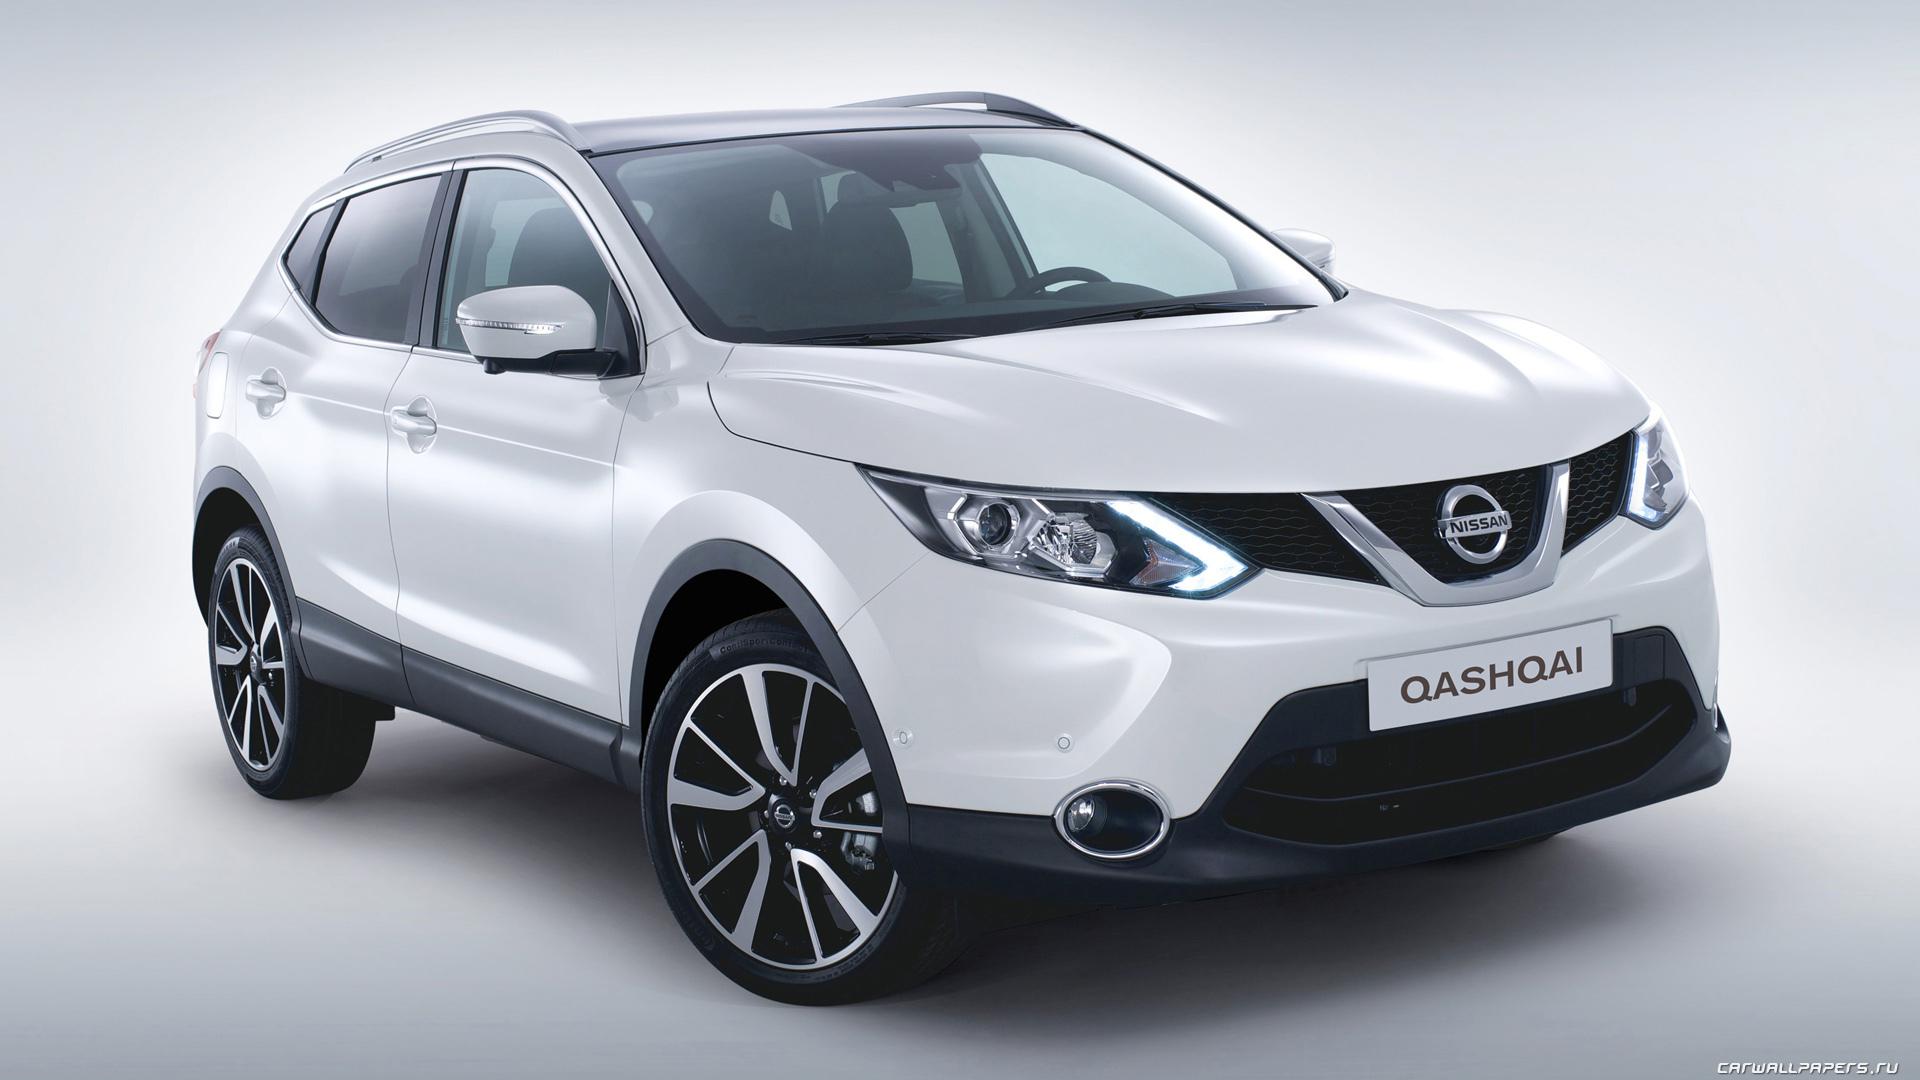 Автомобиль марки Nissan модели Quashqai 2014 - обои для ...: http://www.zastavki.com/rus/Auto/Nissan/wallpaper-62653.htm